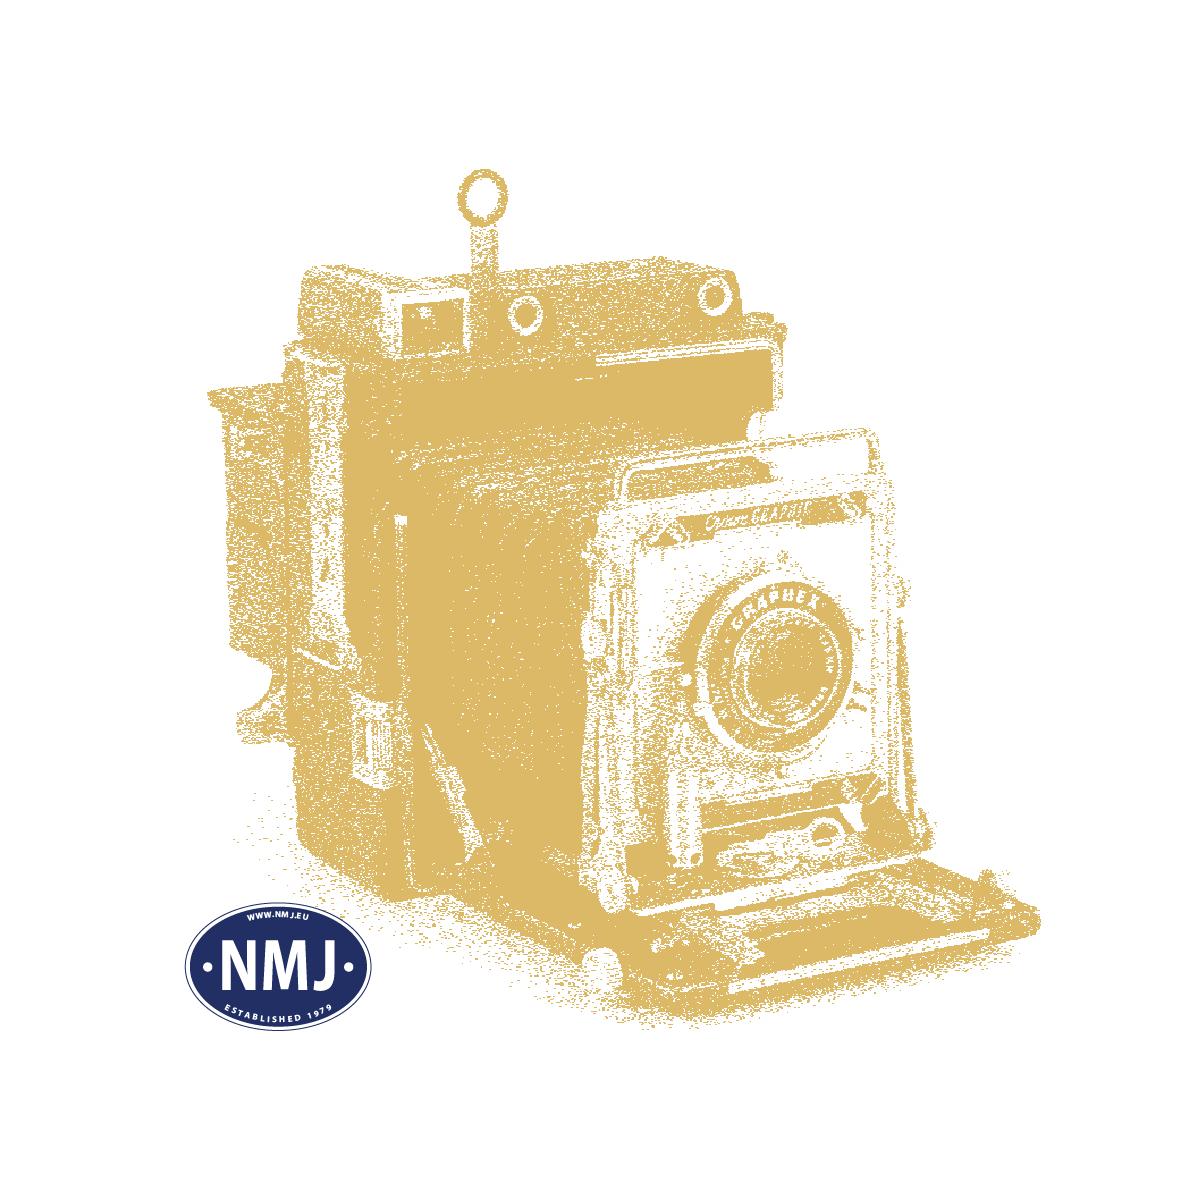 NOC08300 - Strøgress, 2,5 mm, Vårgrønn